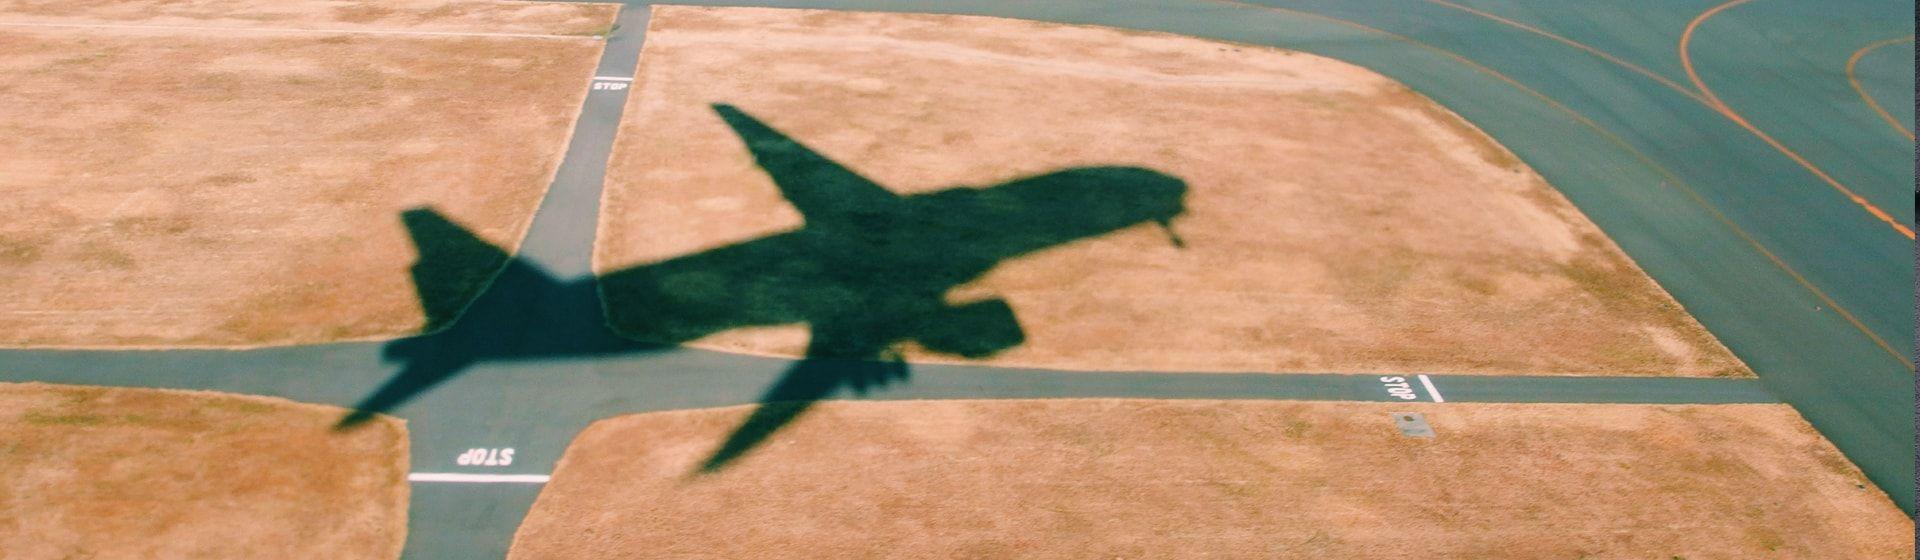 Die Airline Small Planet hat Insolvenz angemeldet.